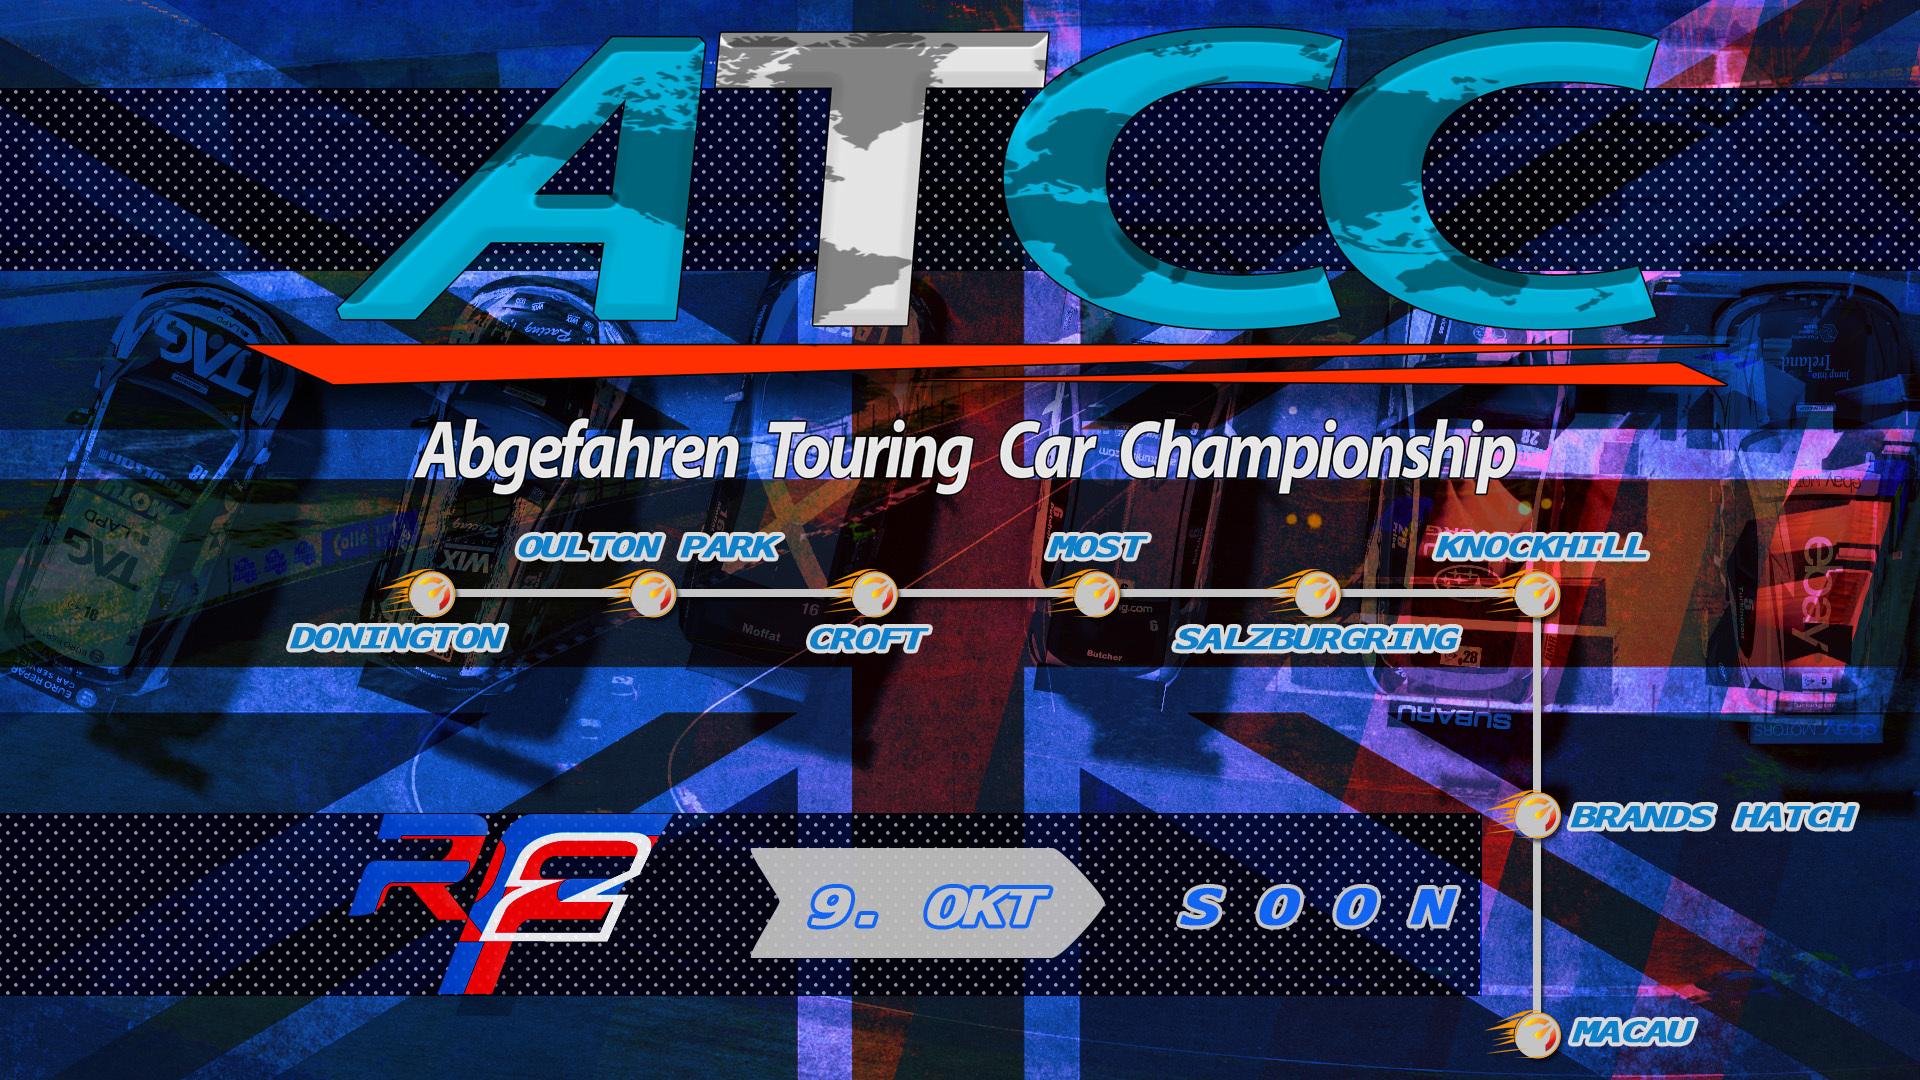 rF2- Abgefahren Touring Car Championship